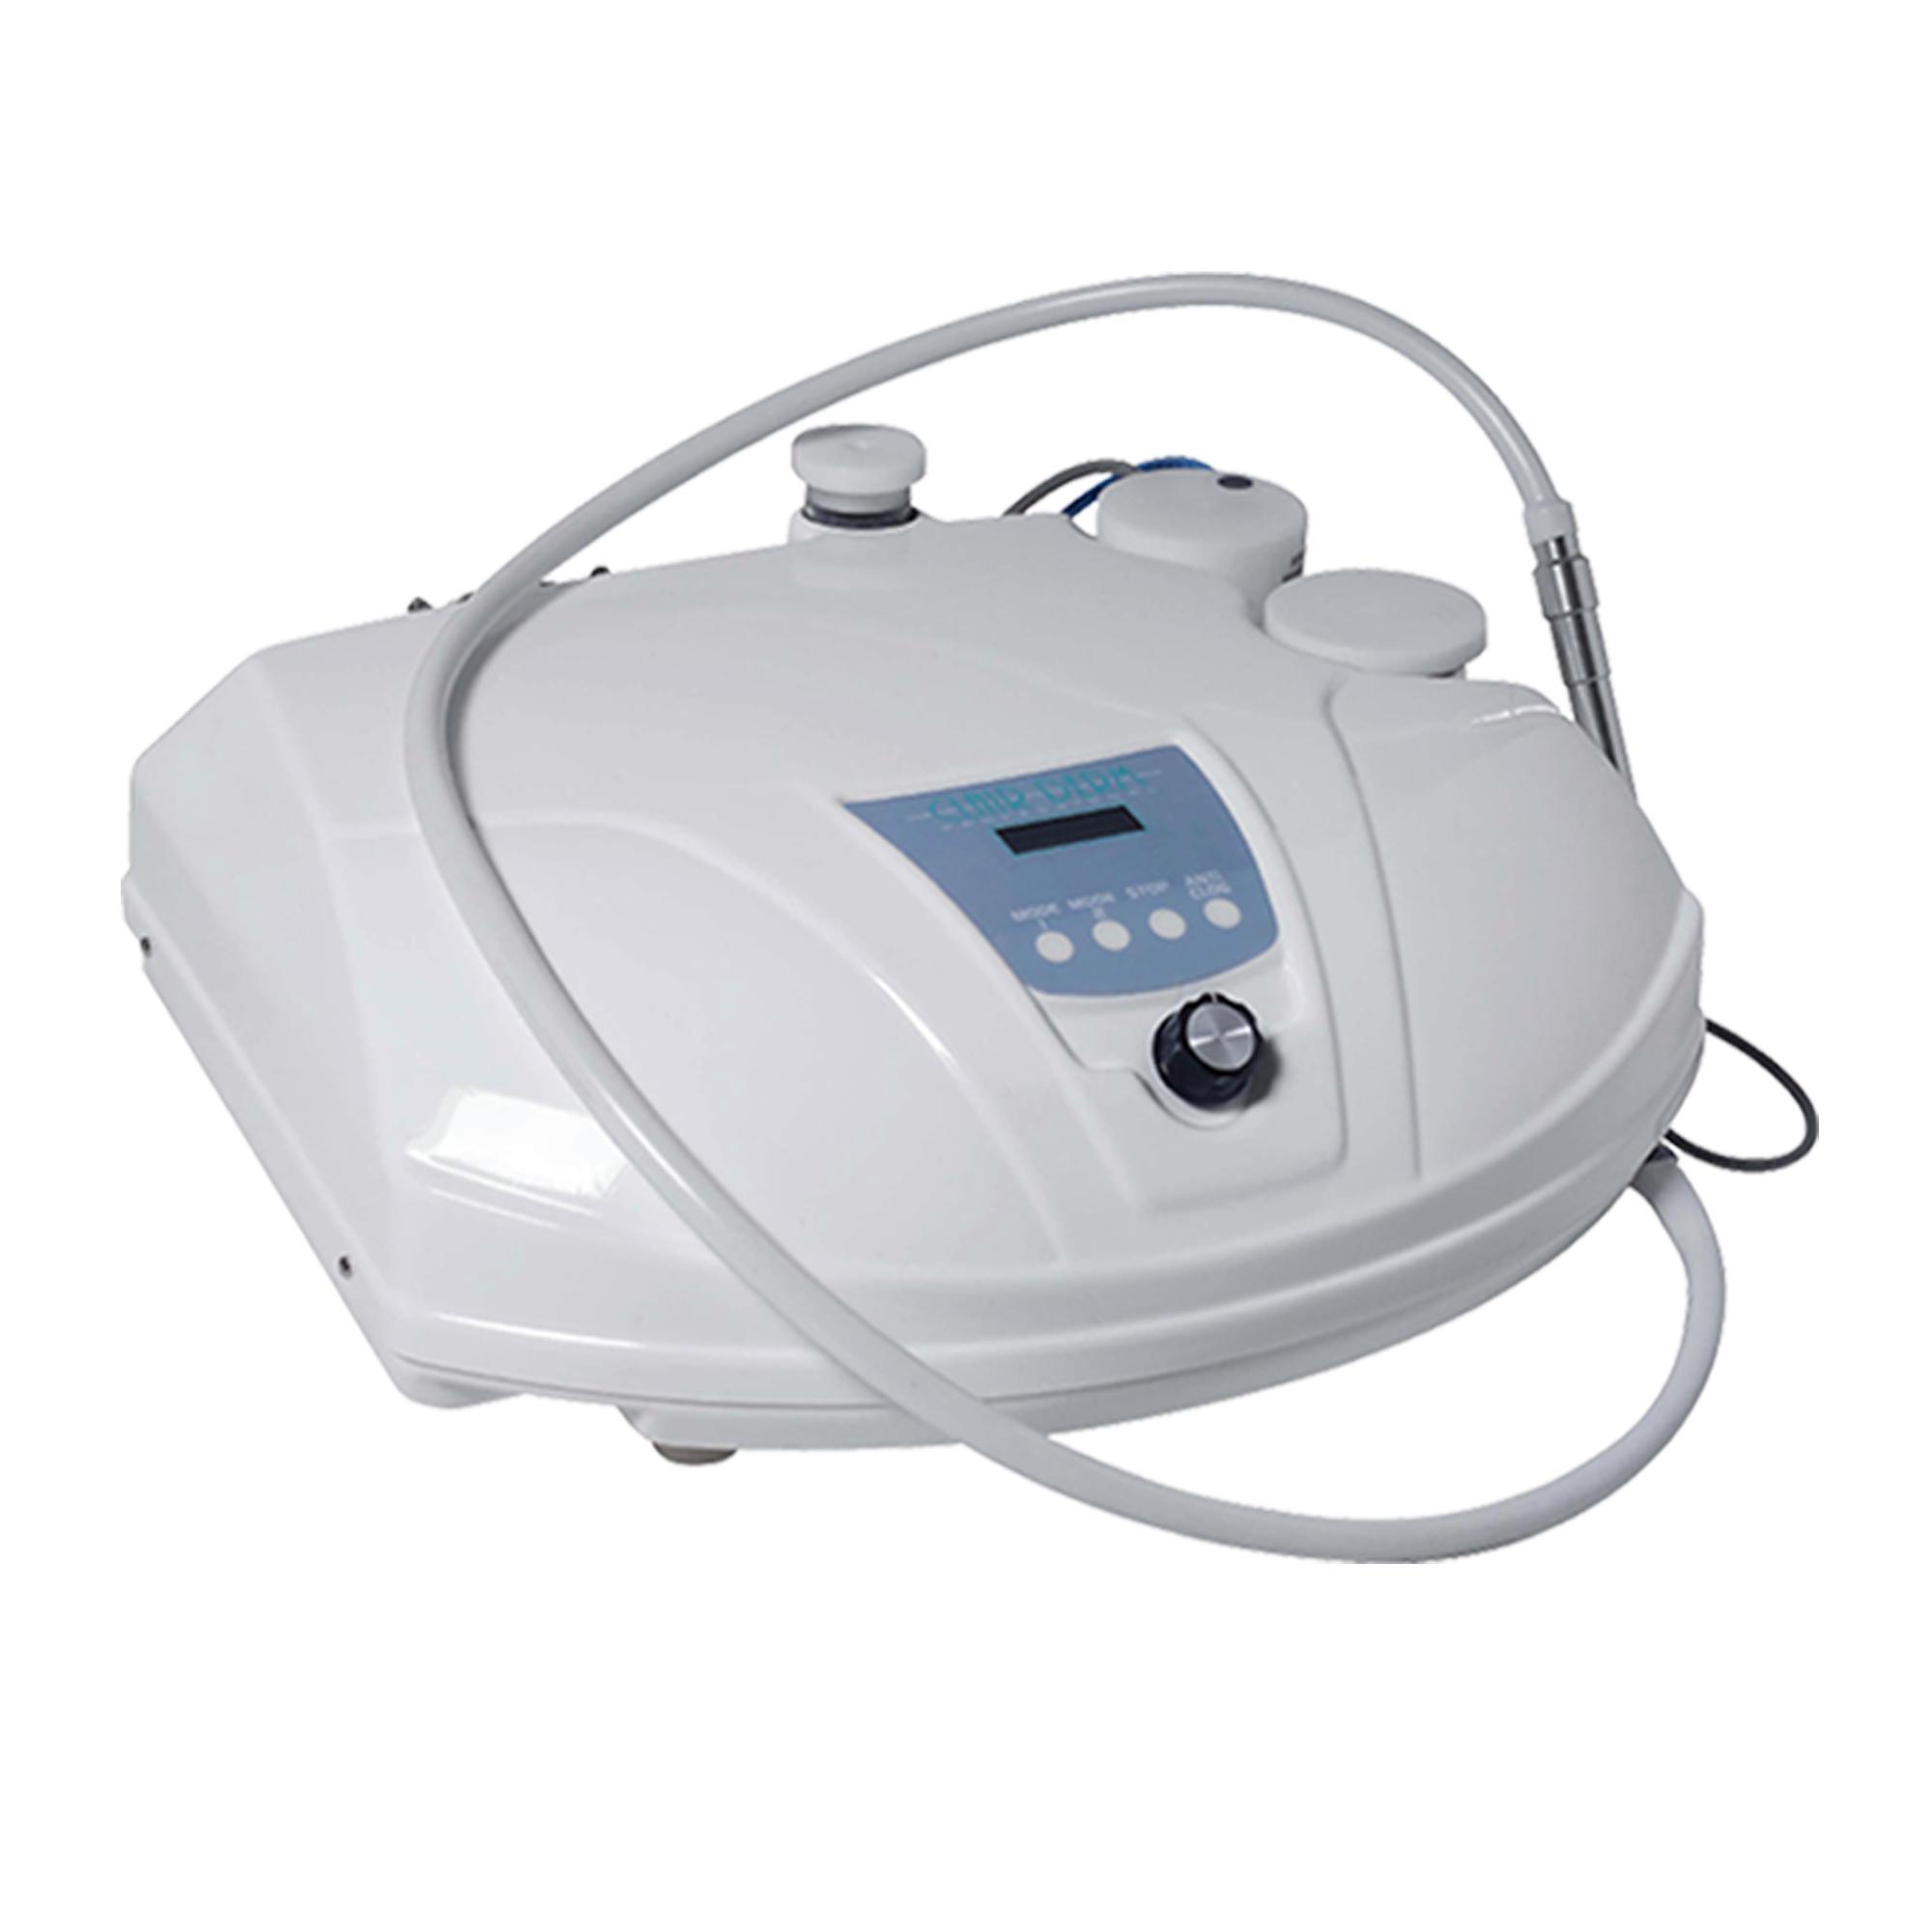 Microdermabrasion machine